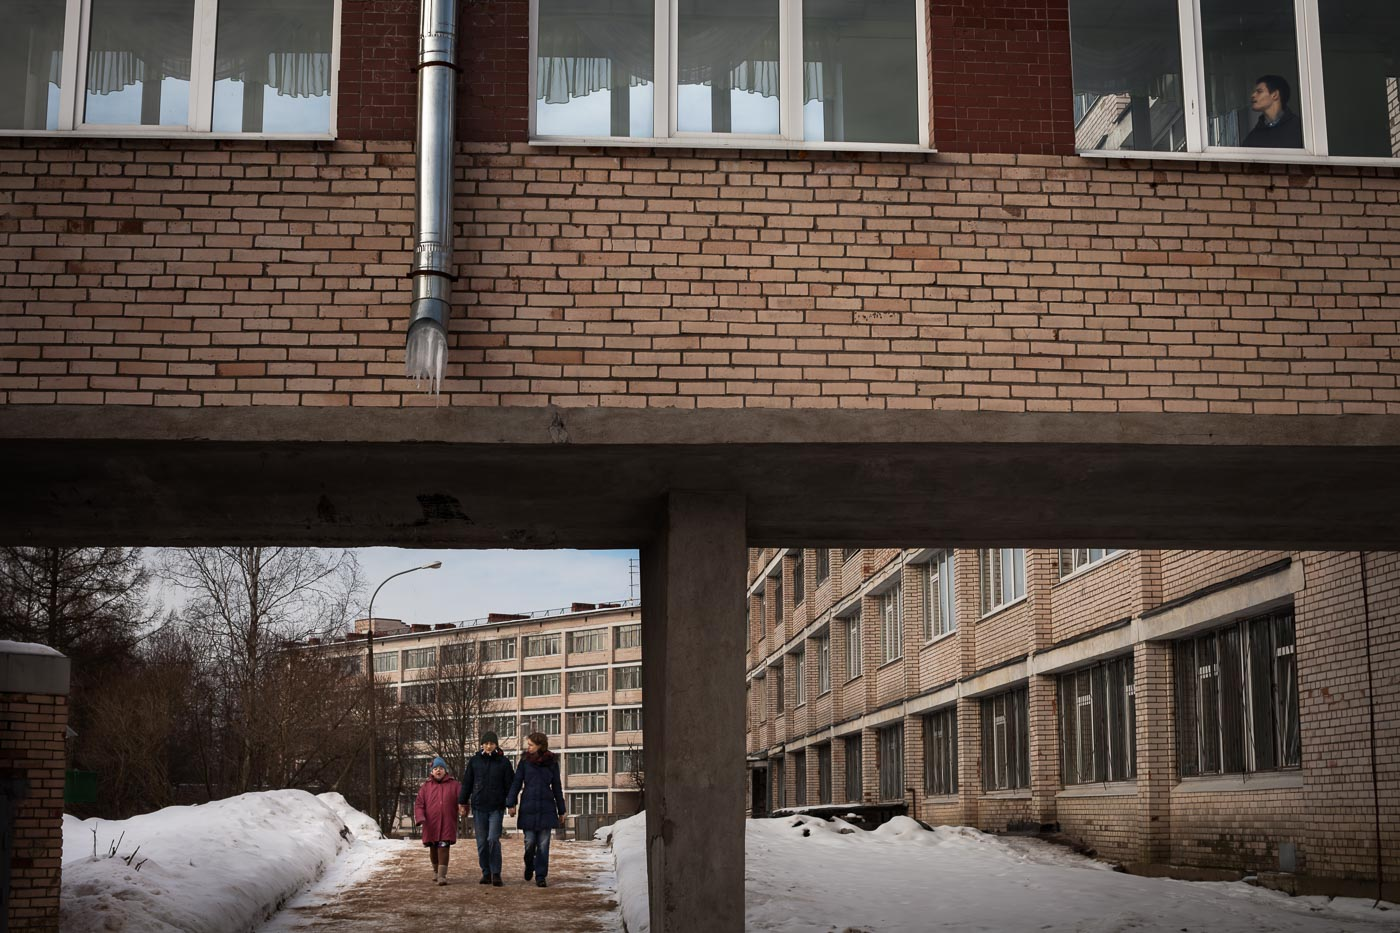 Homelessness as a Public Health Problem